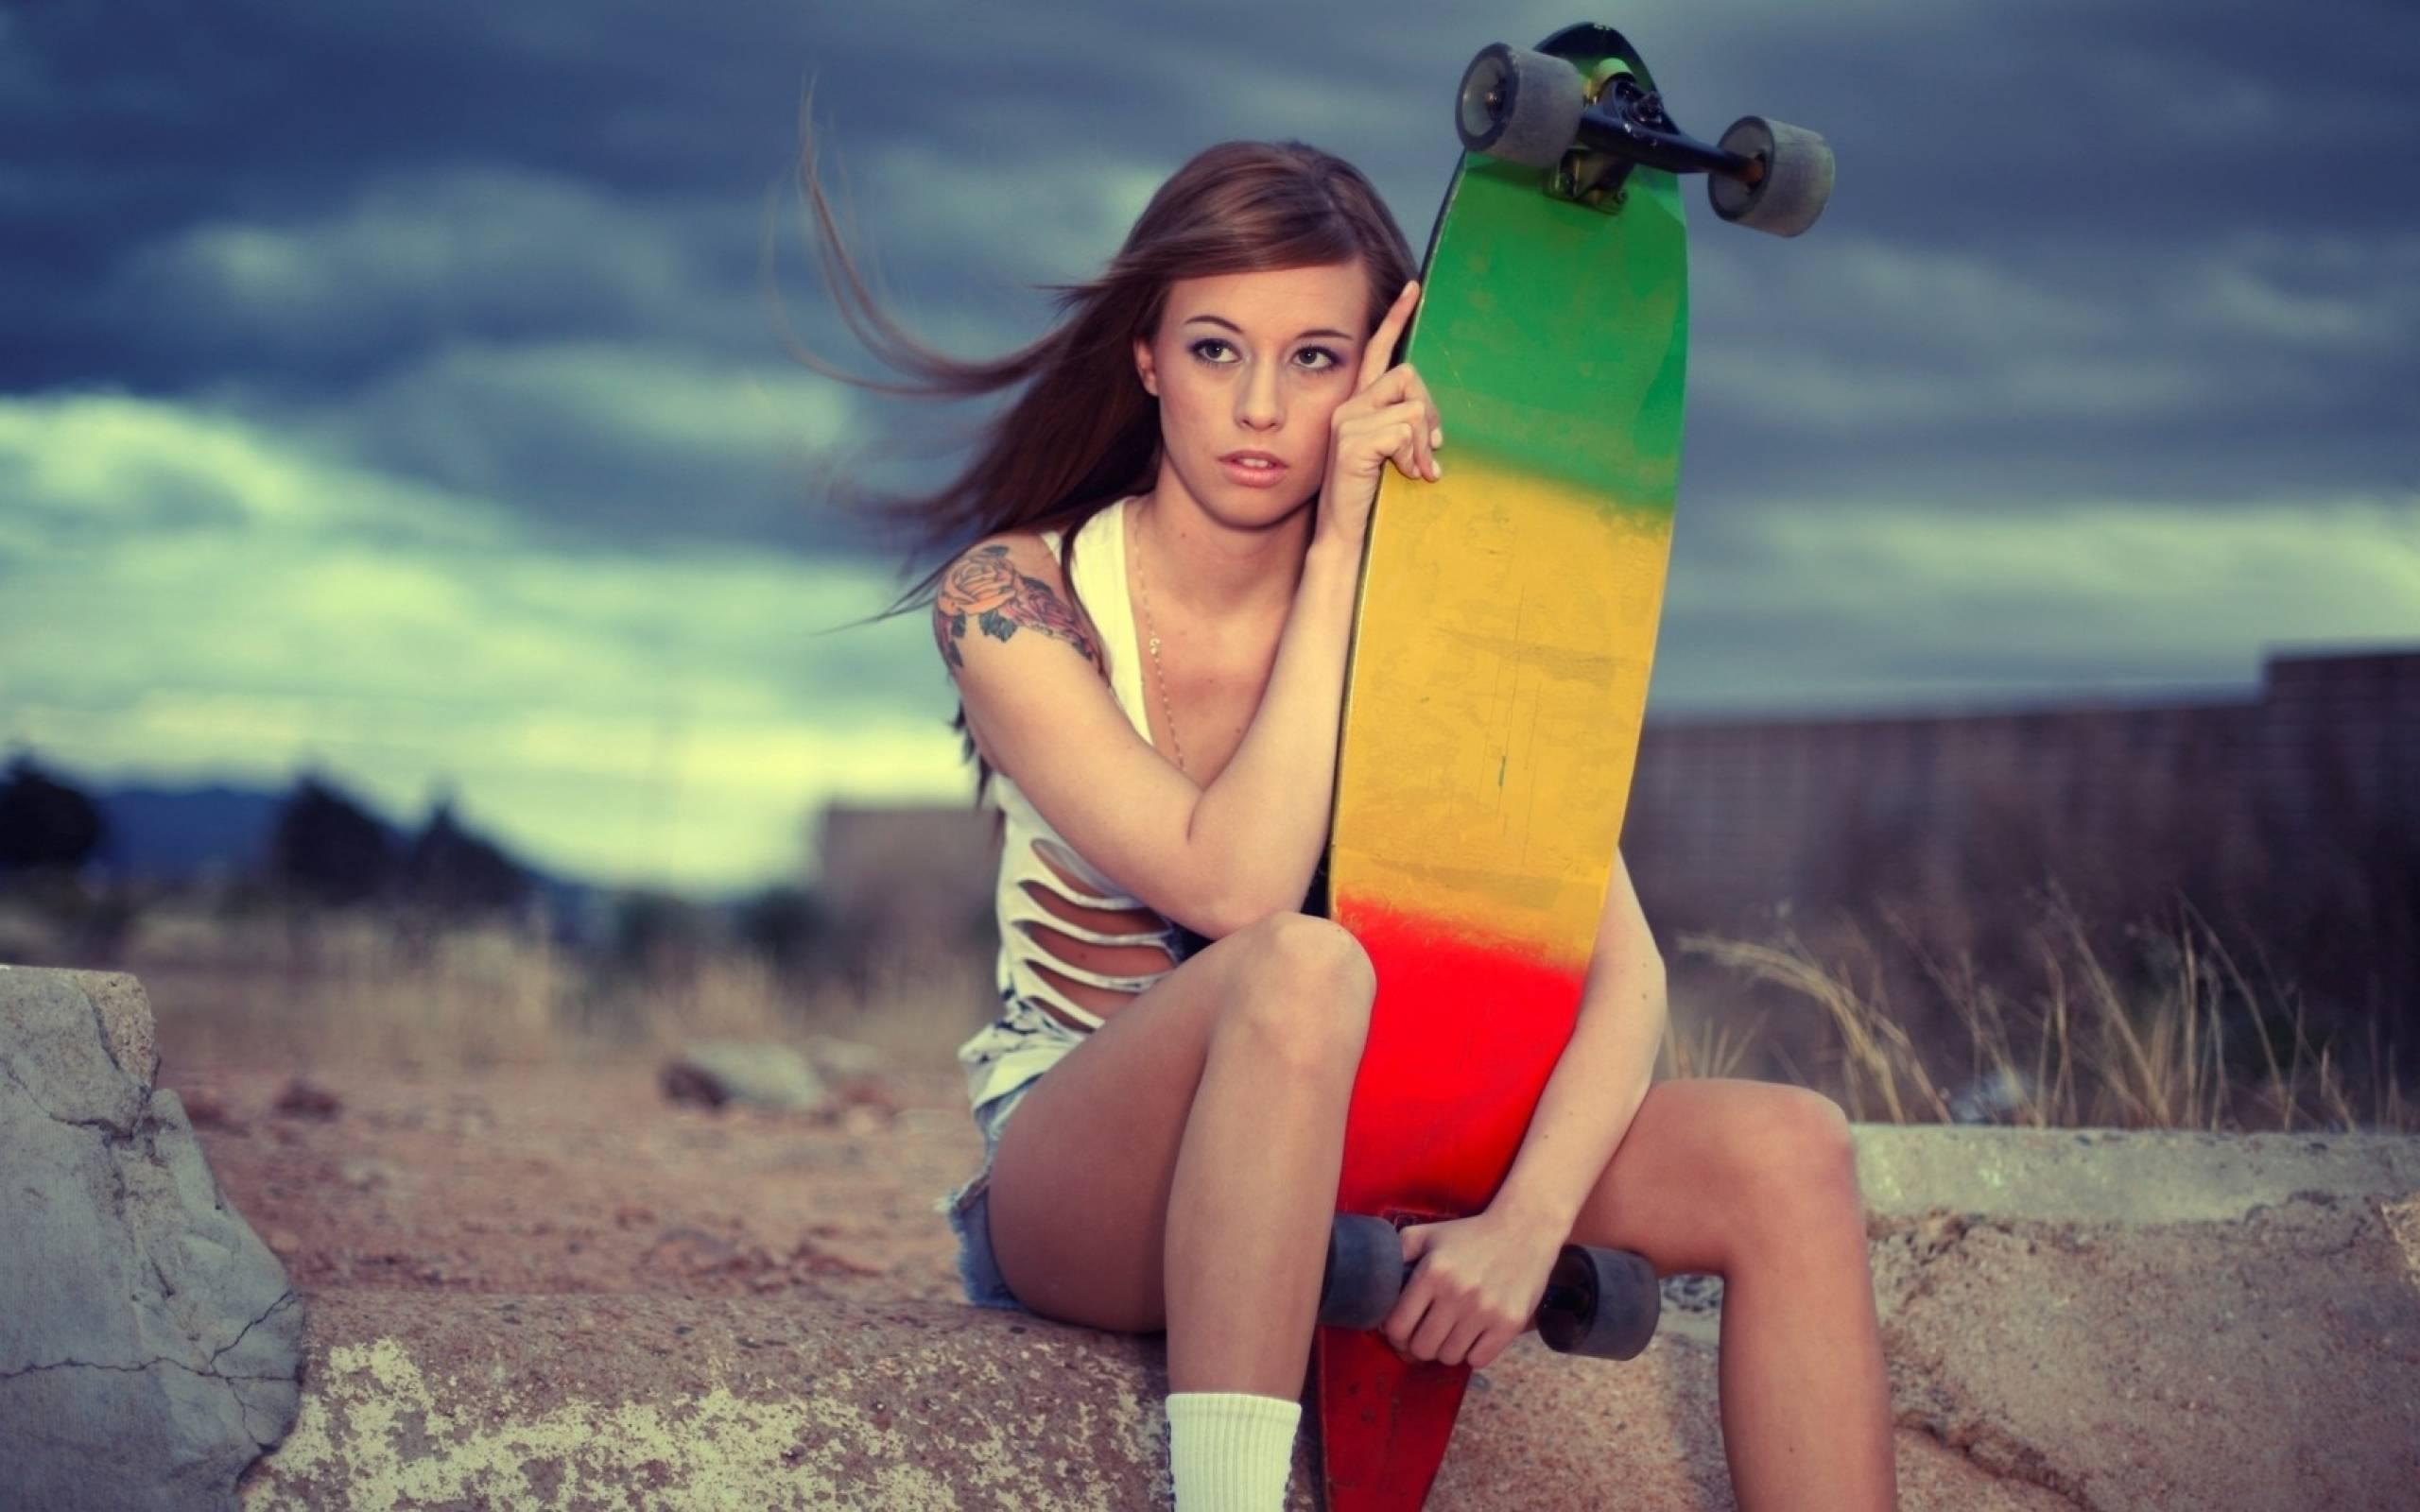 Skateboard Girls Wallpapers Wallpaper Cave